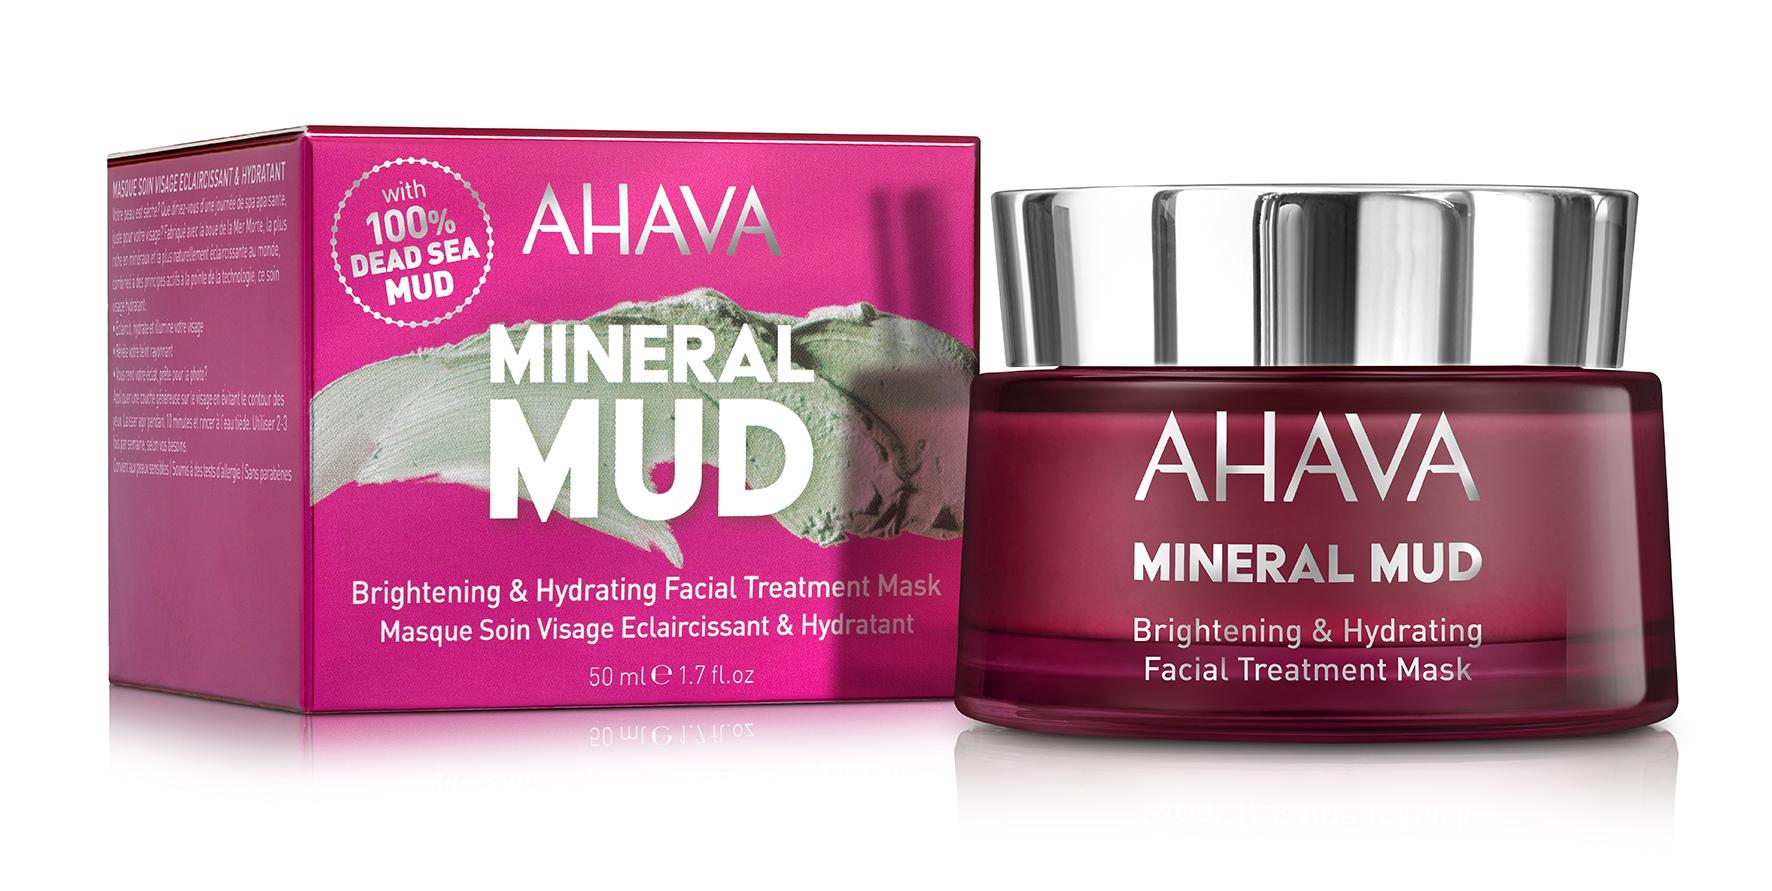 AHAVA Маска увлажняющая придающая сияние для лица / Mineral Mud Masks 50 мл